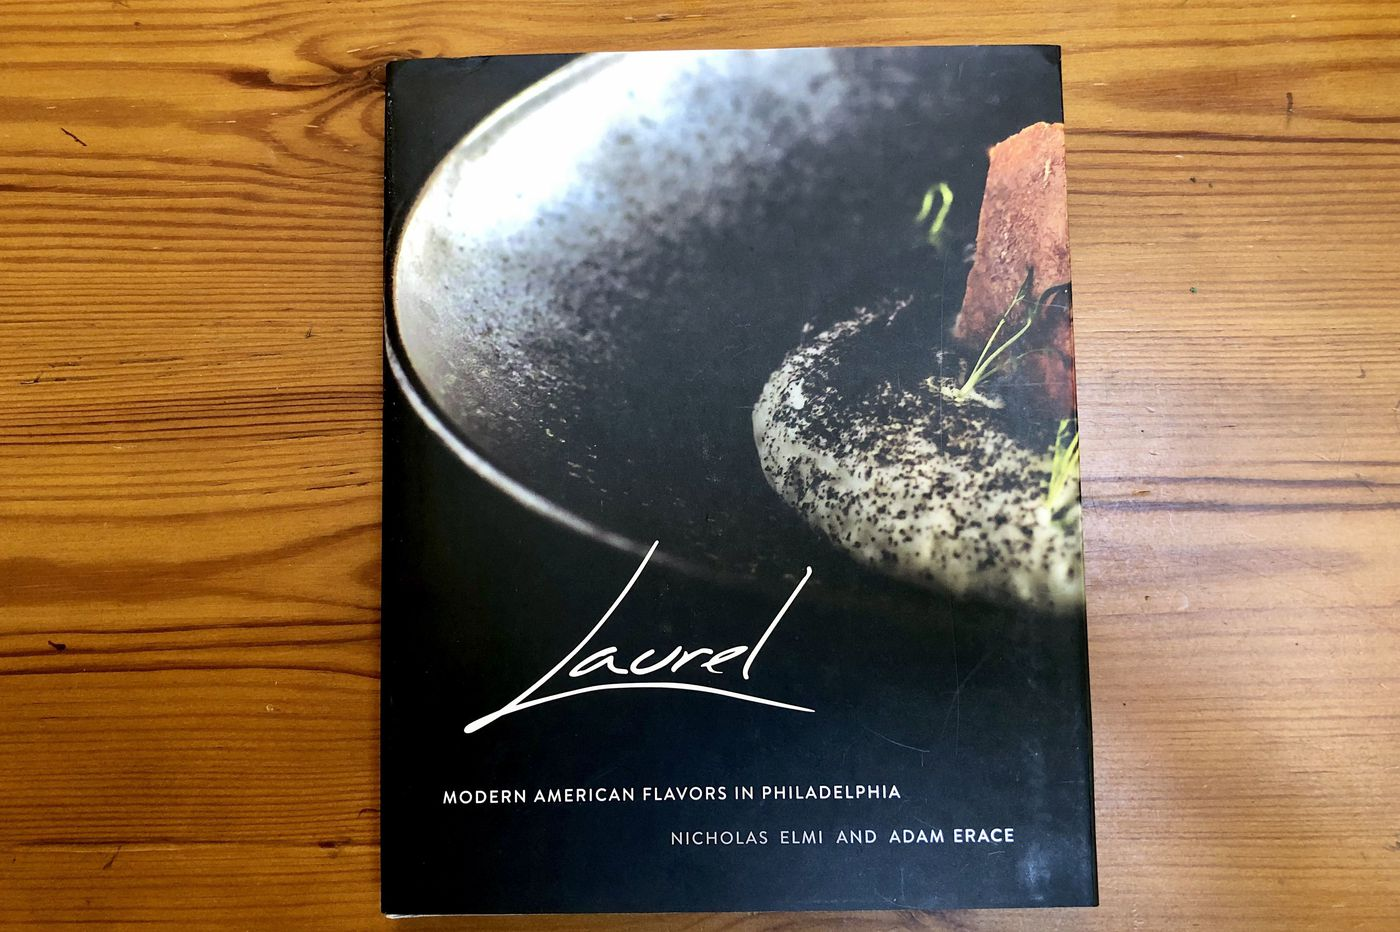 Laurel and chef Nick Elmi: New look, new book